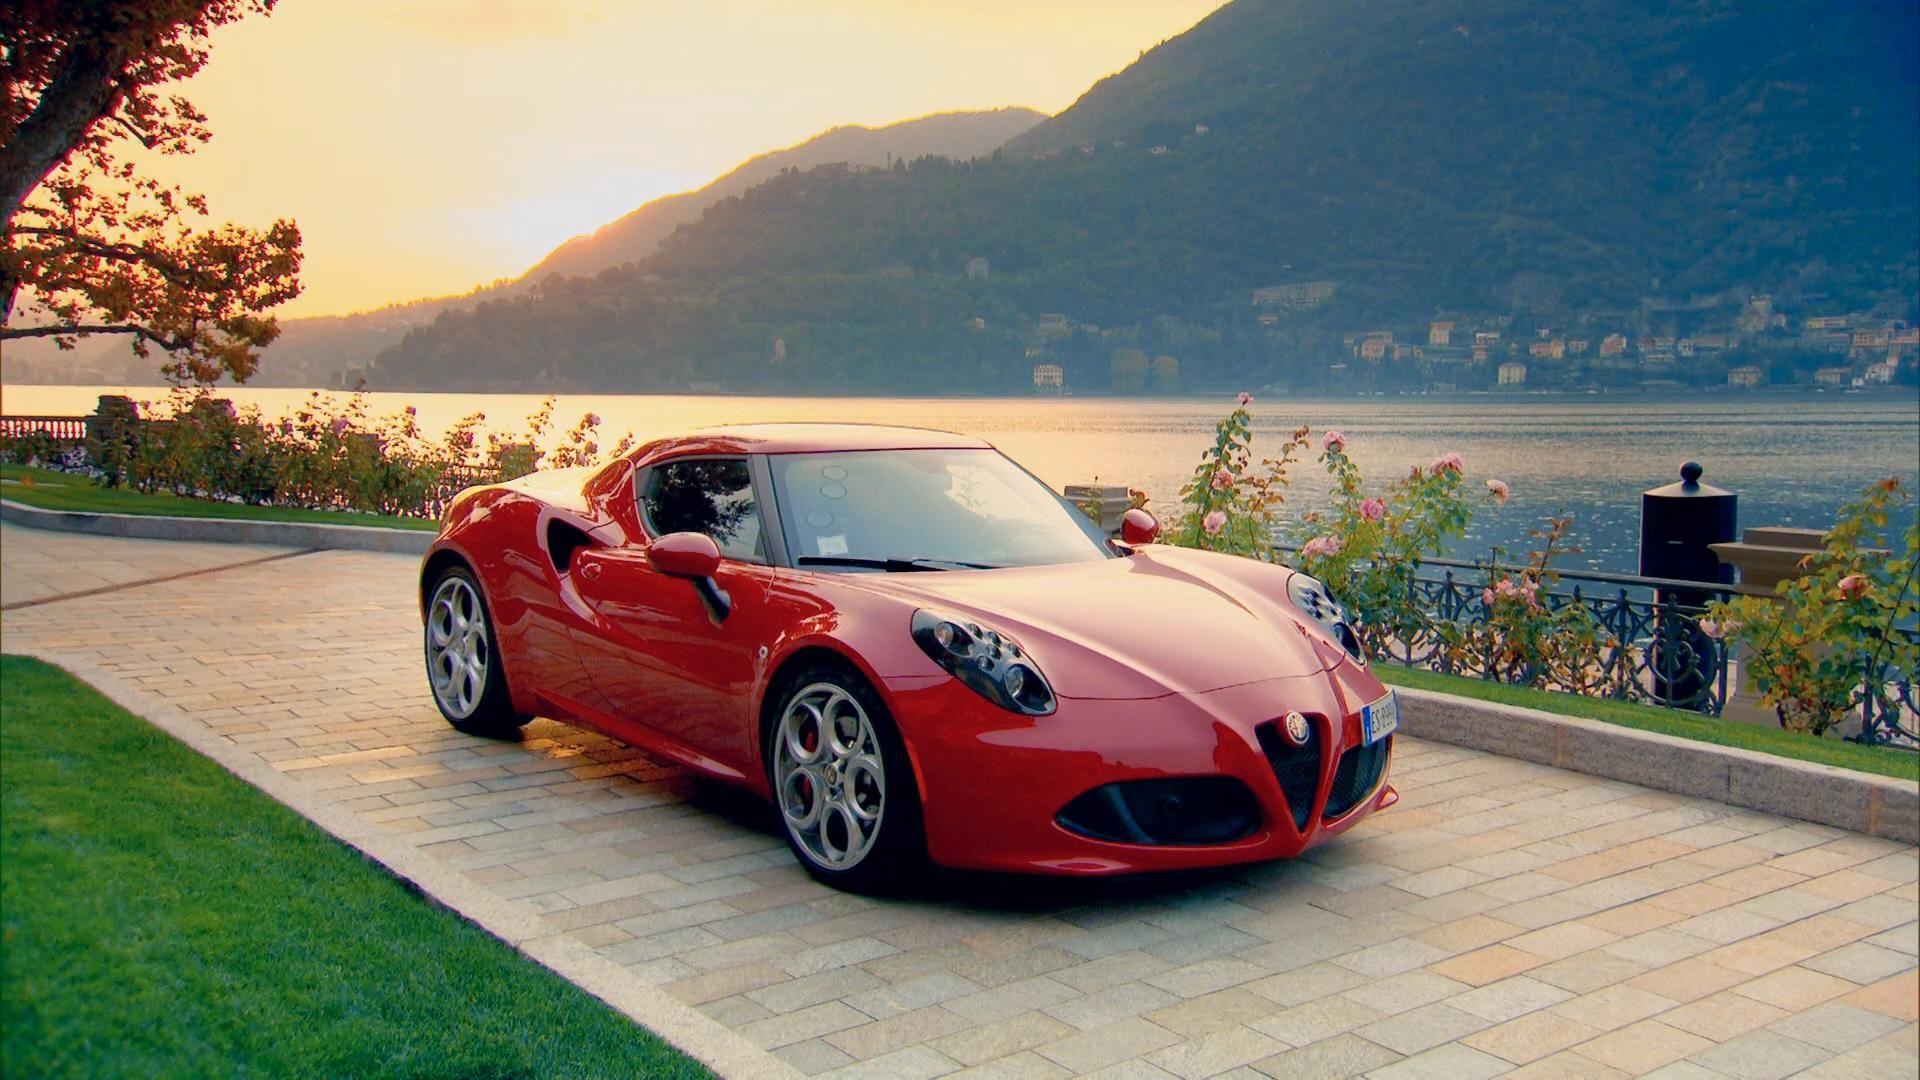 Red Alfa Romeo 4c Photo Wallpaper Alfa Romeo Car In The World